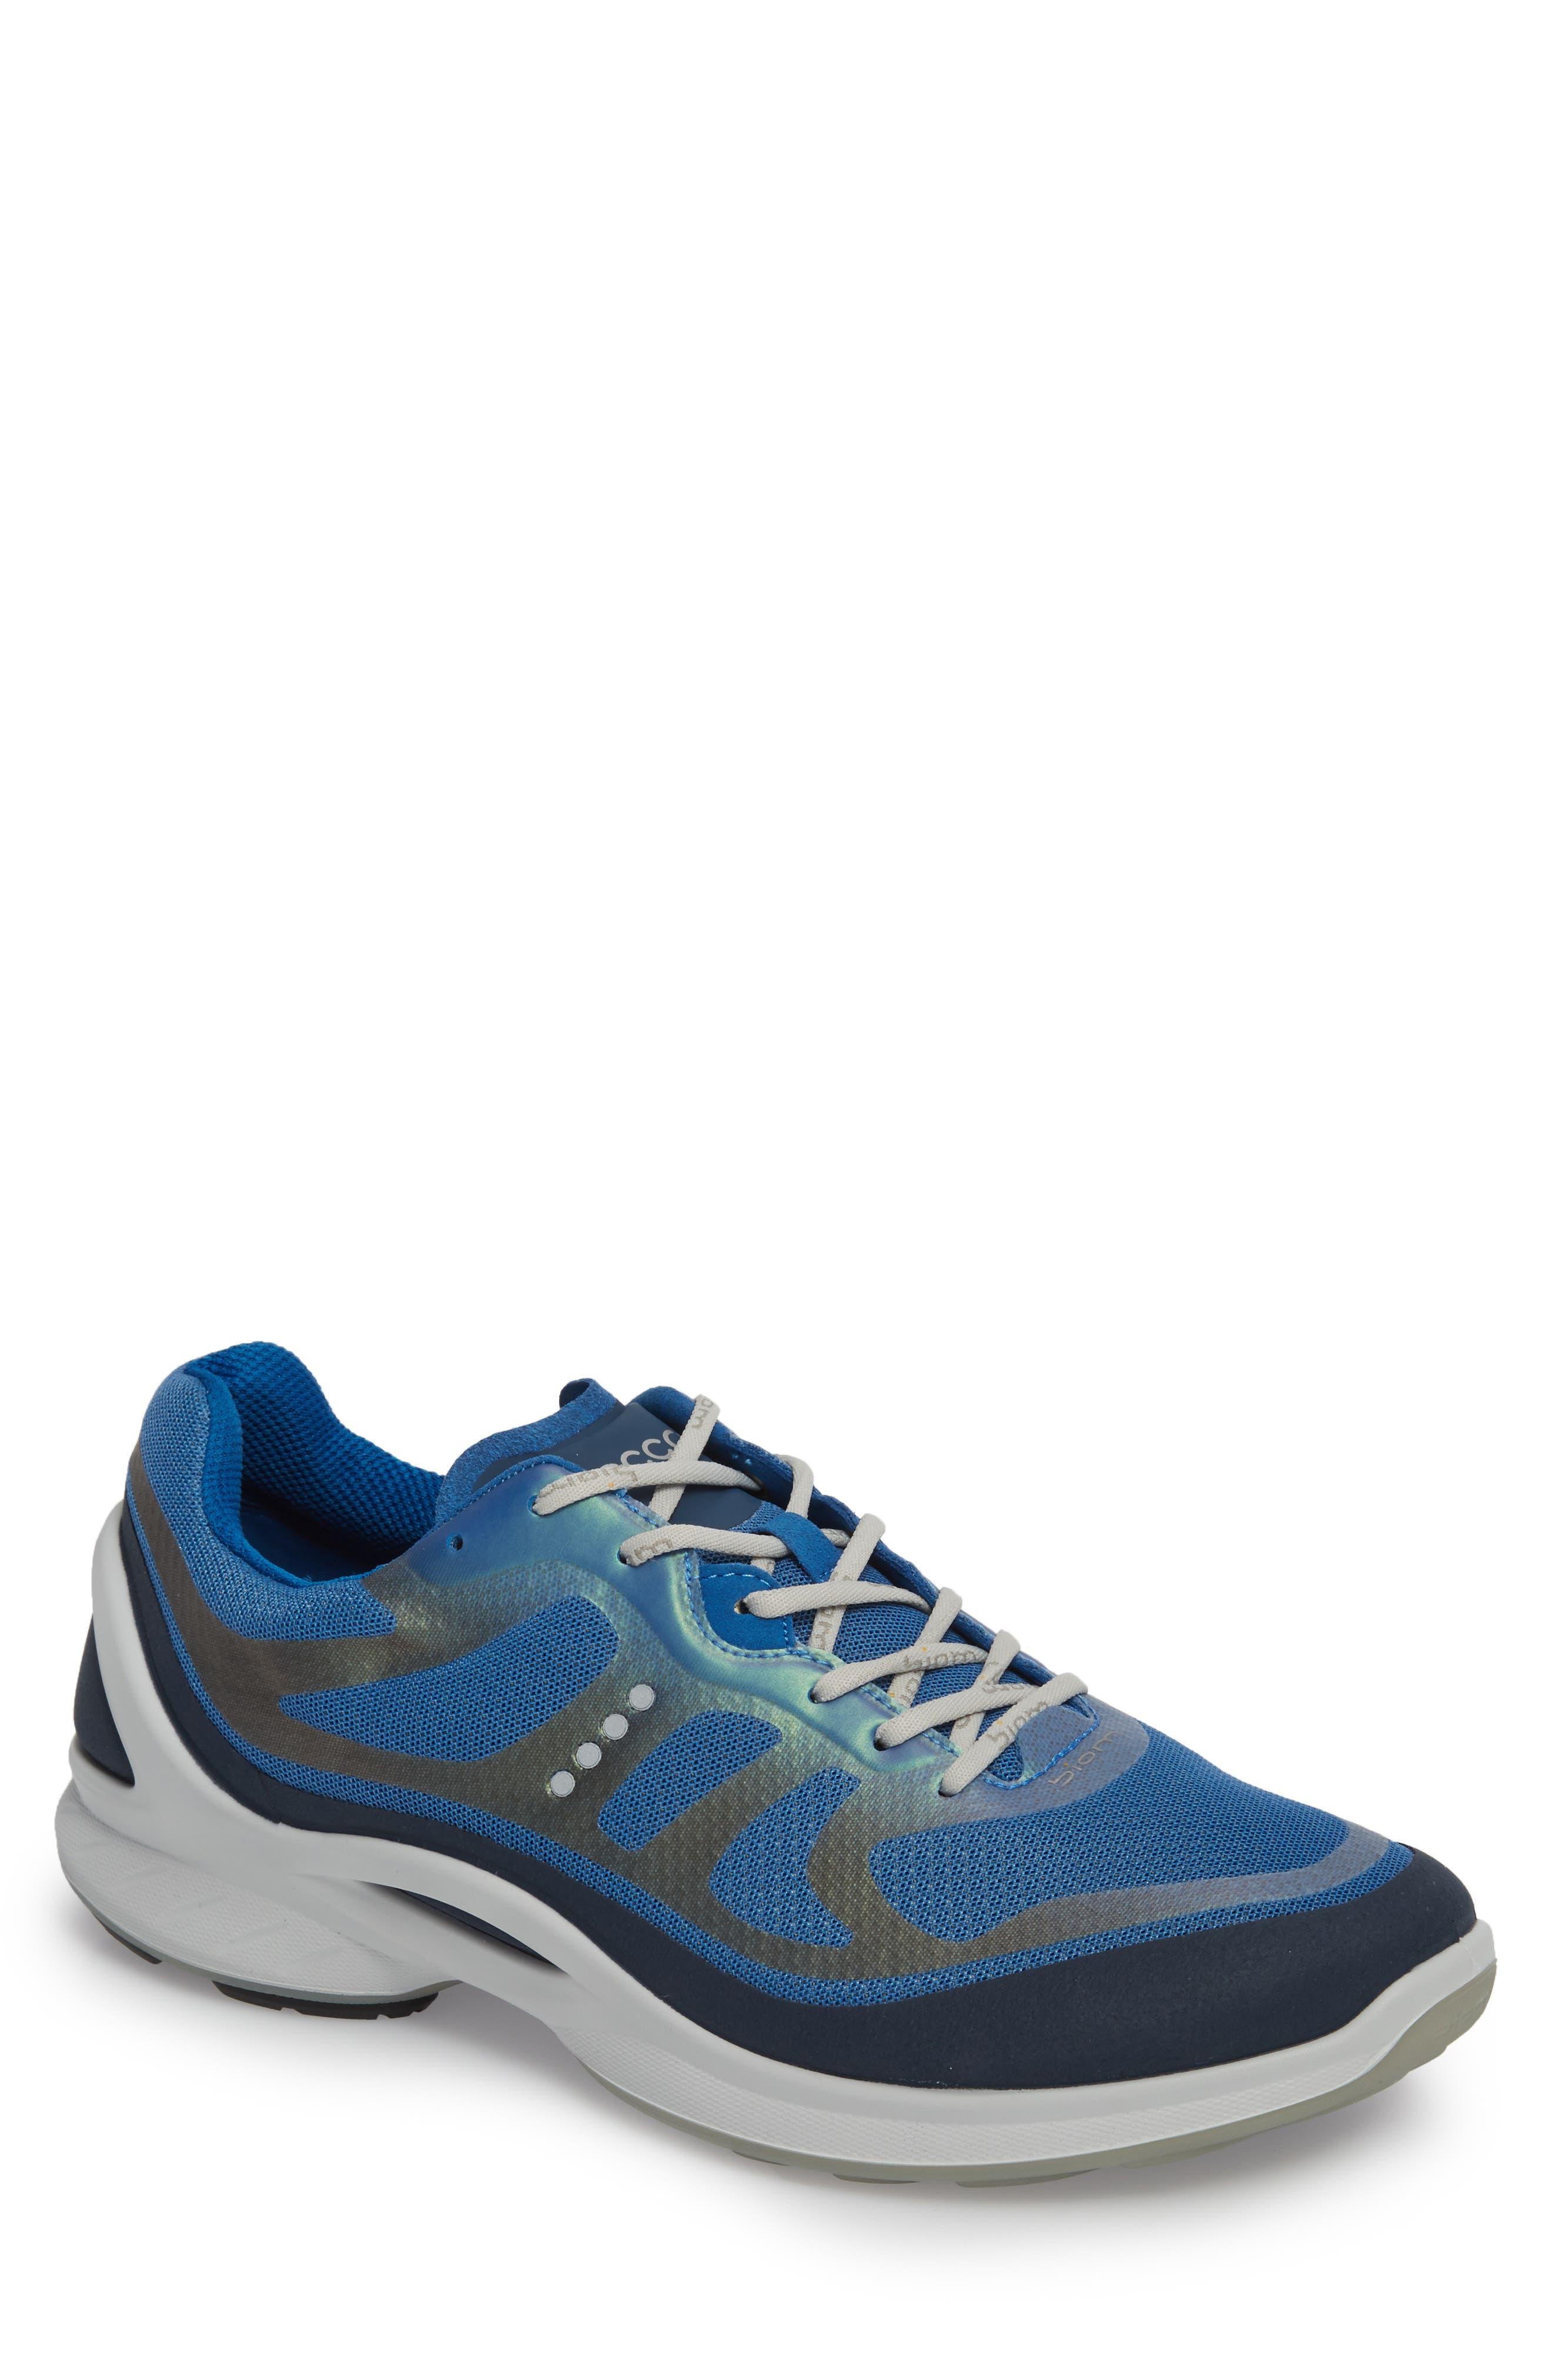 Alternate Image 1 Selected - ECCO BIOM Fjuel Tie Sneaker (Men)